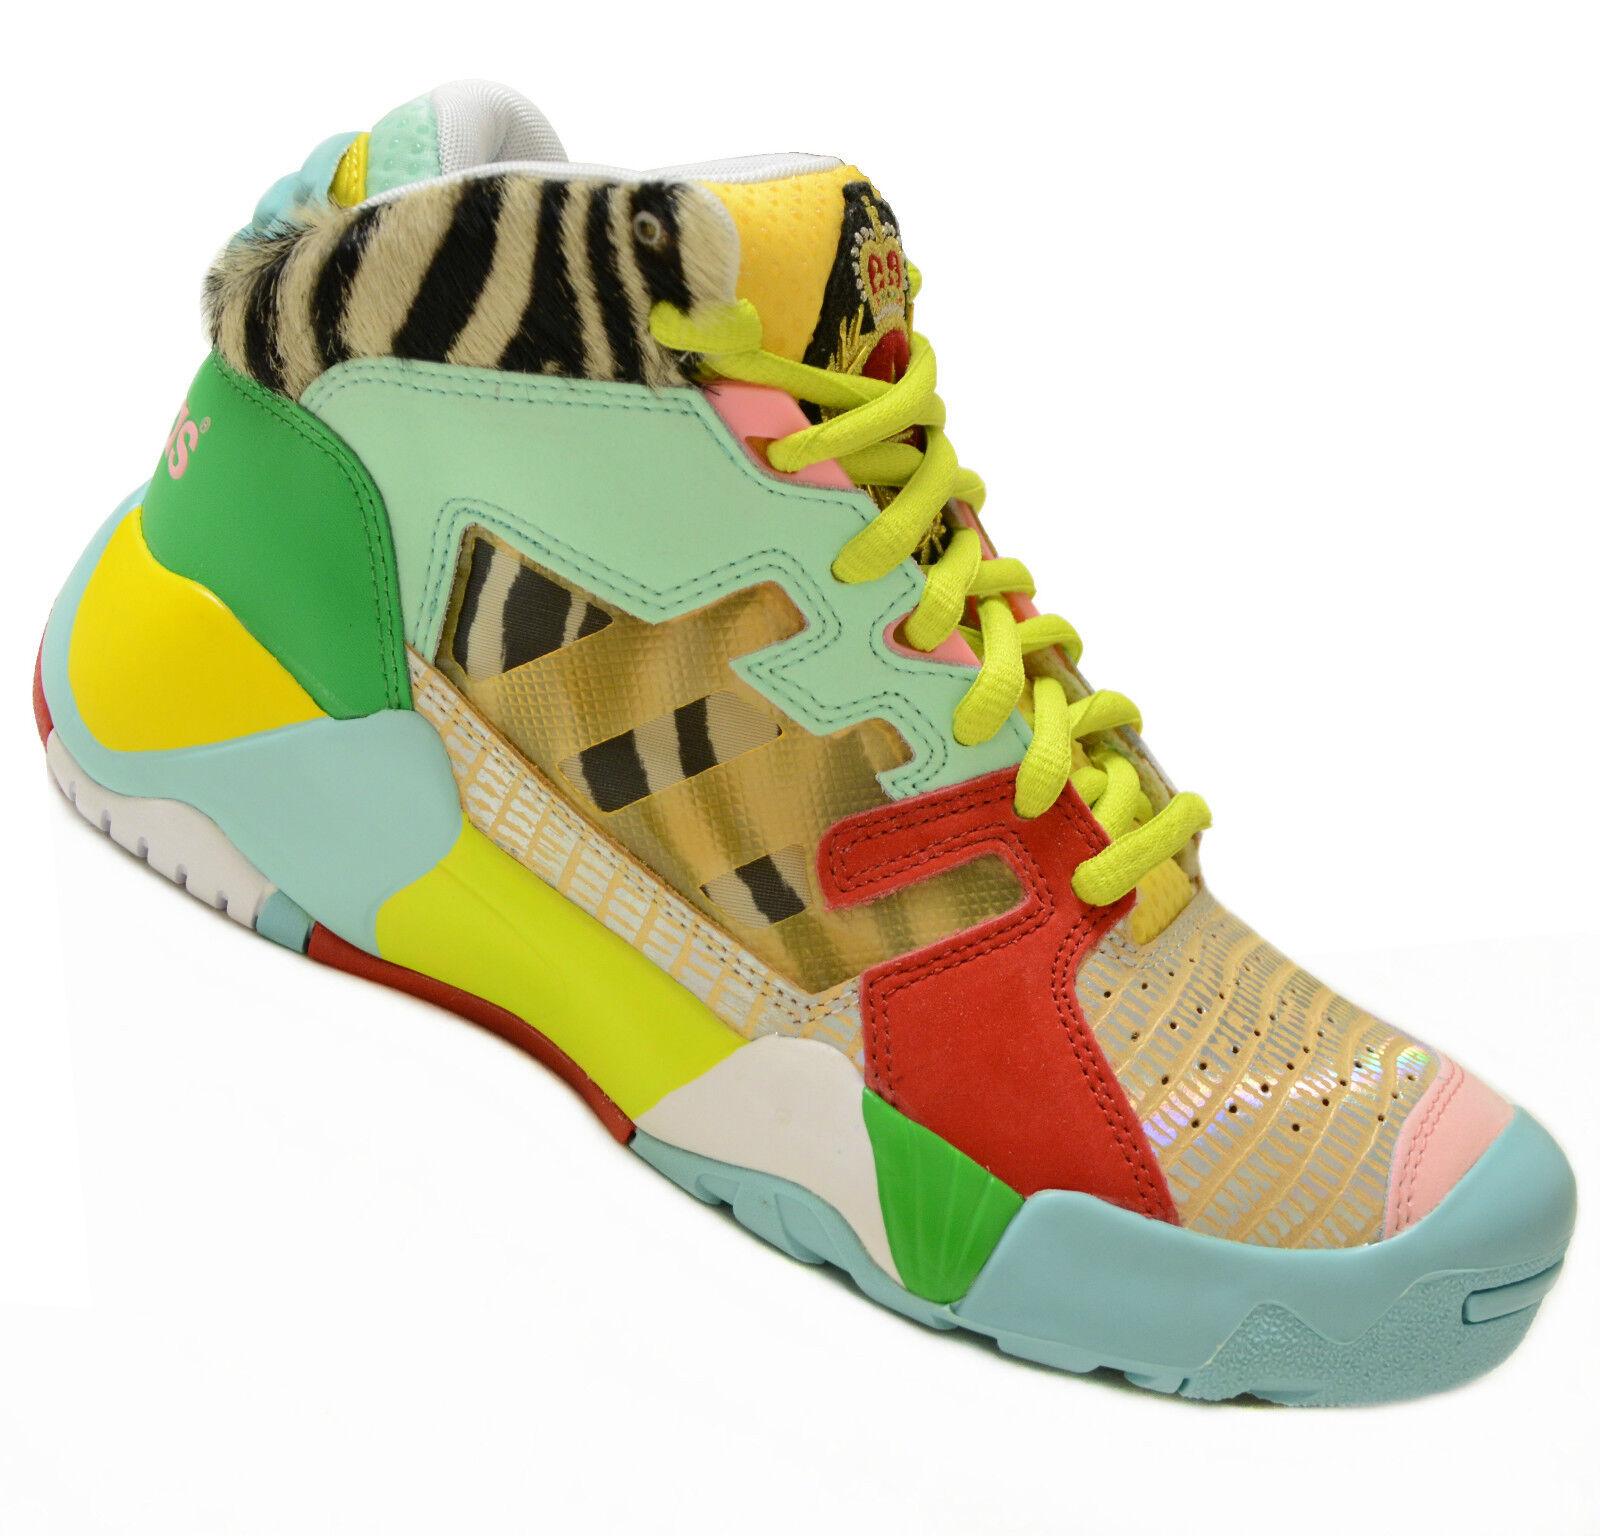 Adidas Originals JS STREET BALL Obyo Schuhe Sneaker  designed by Jeremy Scott